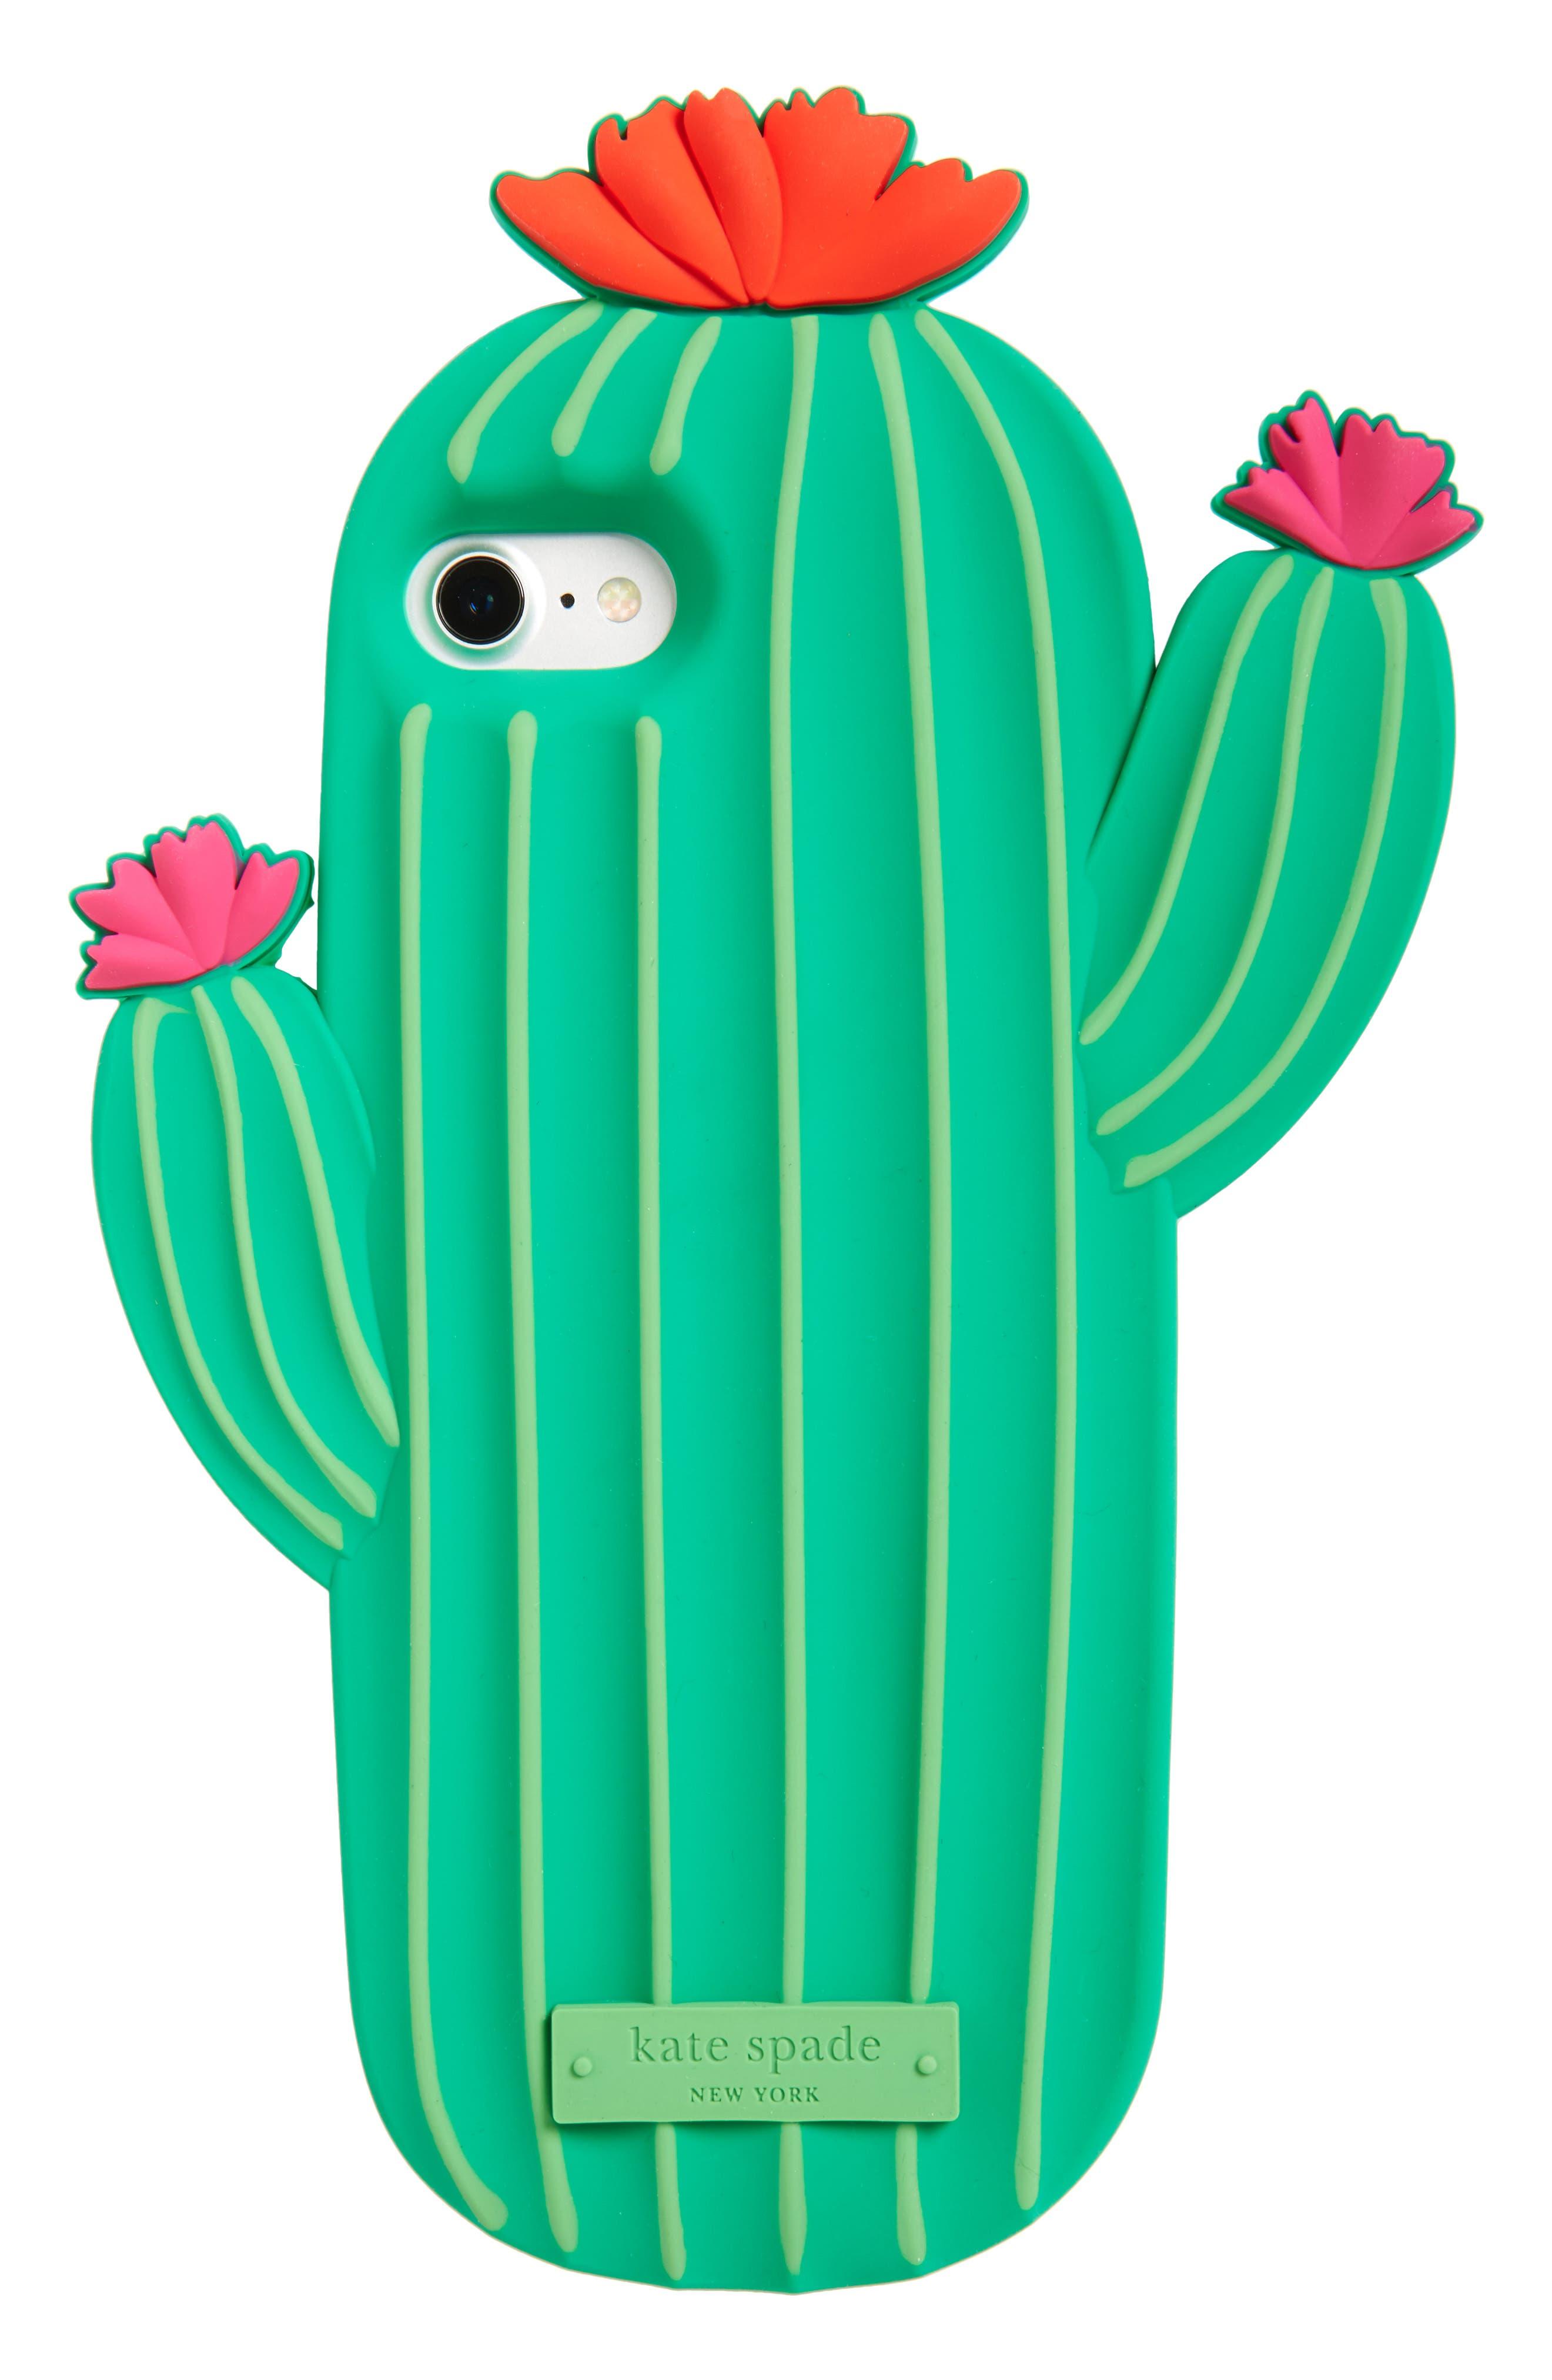 kate spade new york cactus iPhone 7 case